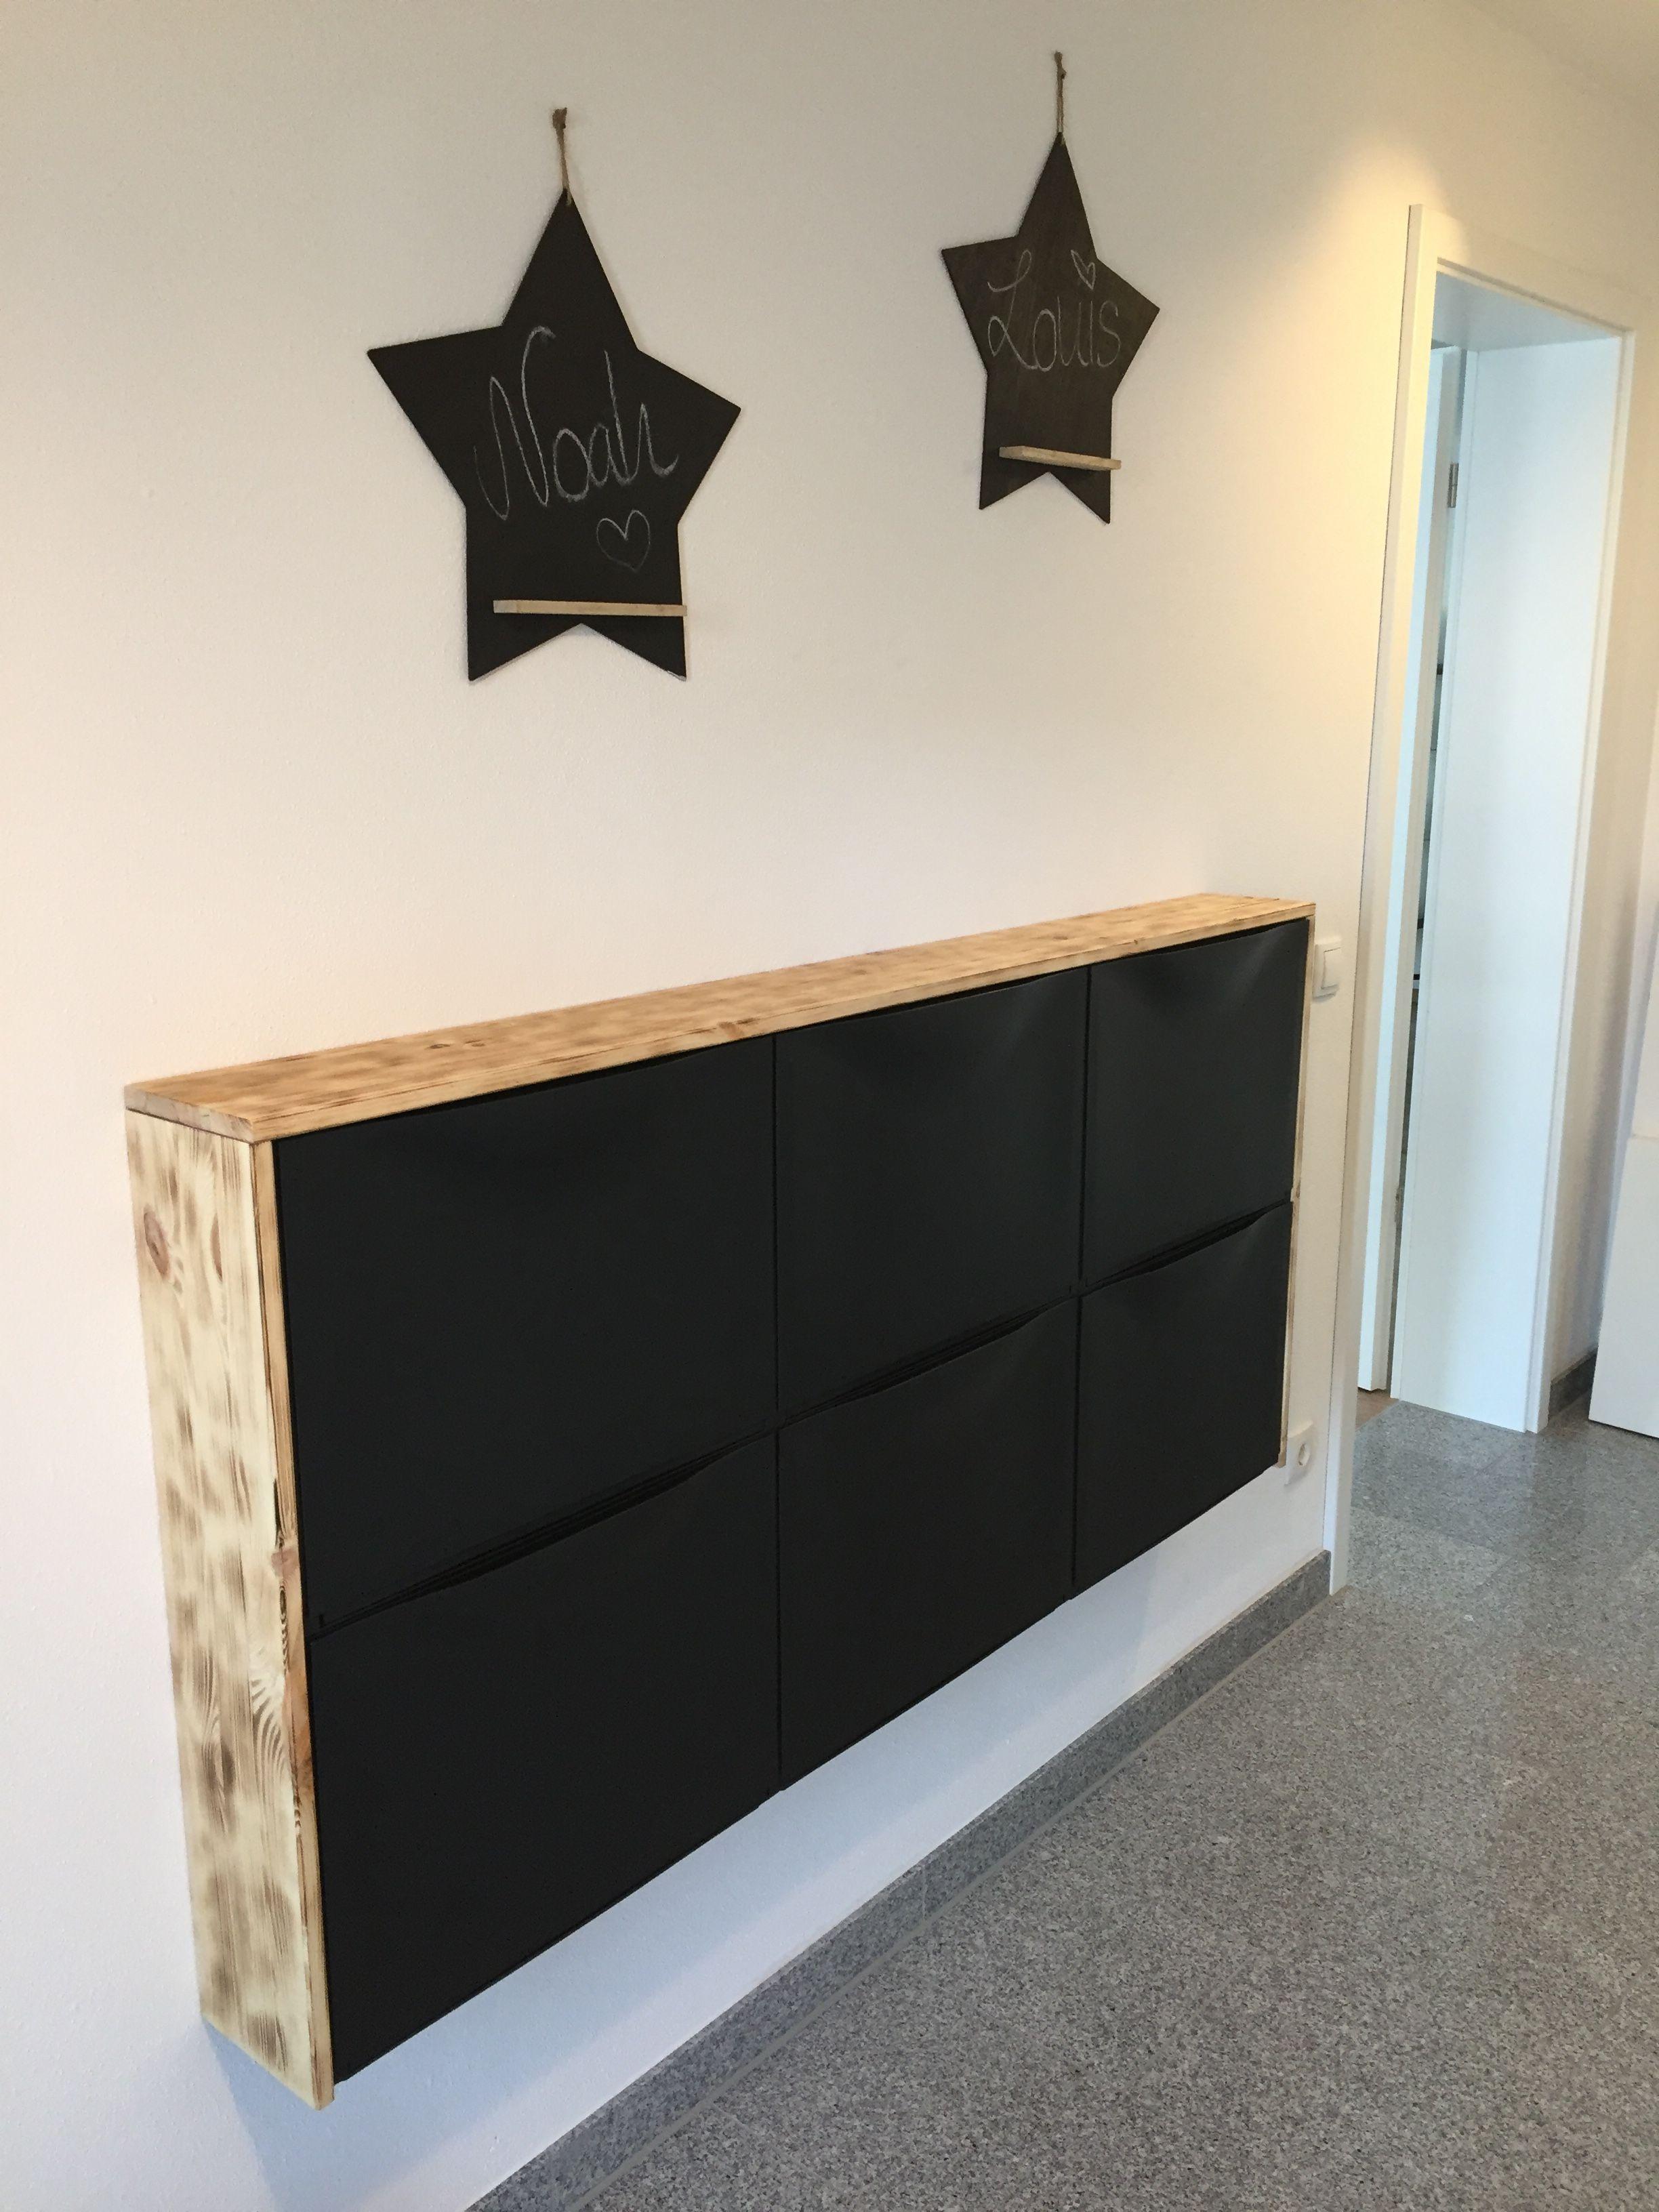 DIY Garderobe IKEA TRONES Fichtenholzbrett mit Bunsenbrenner ...